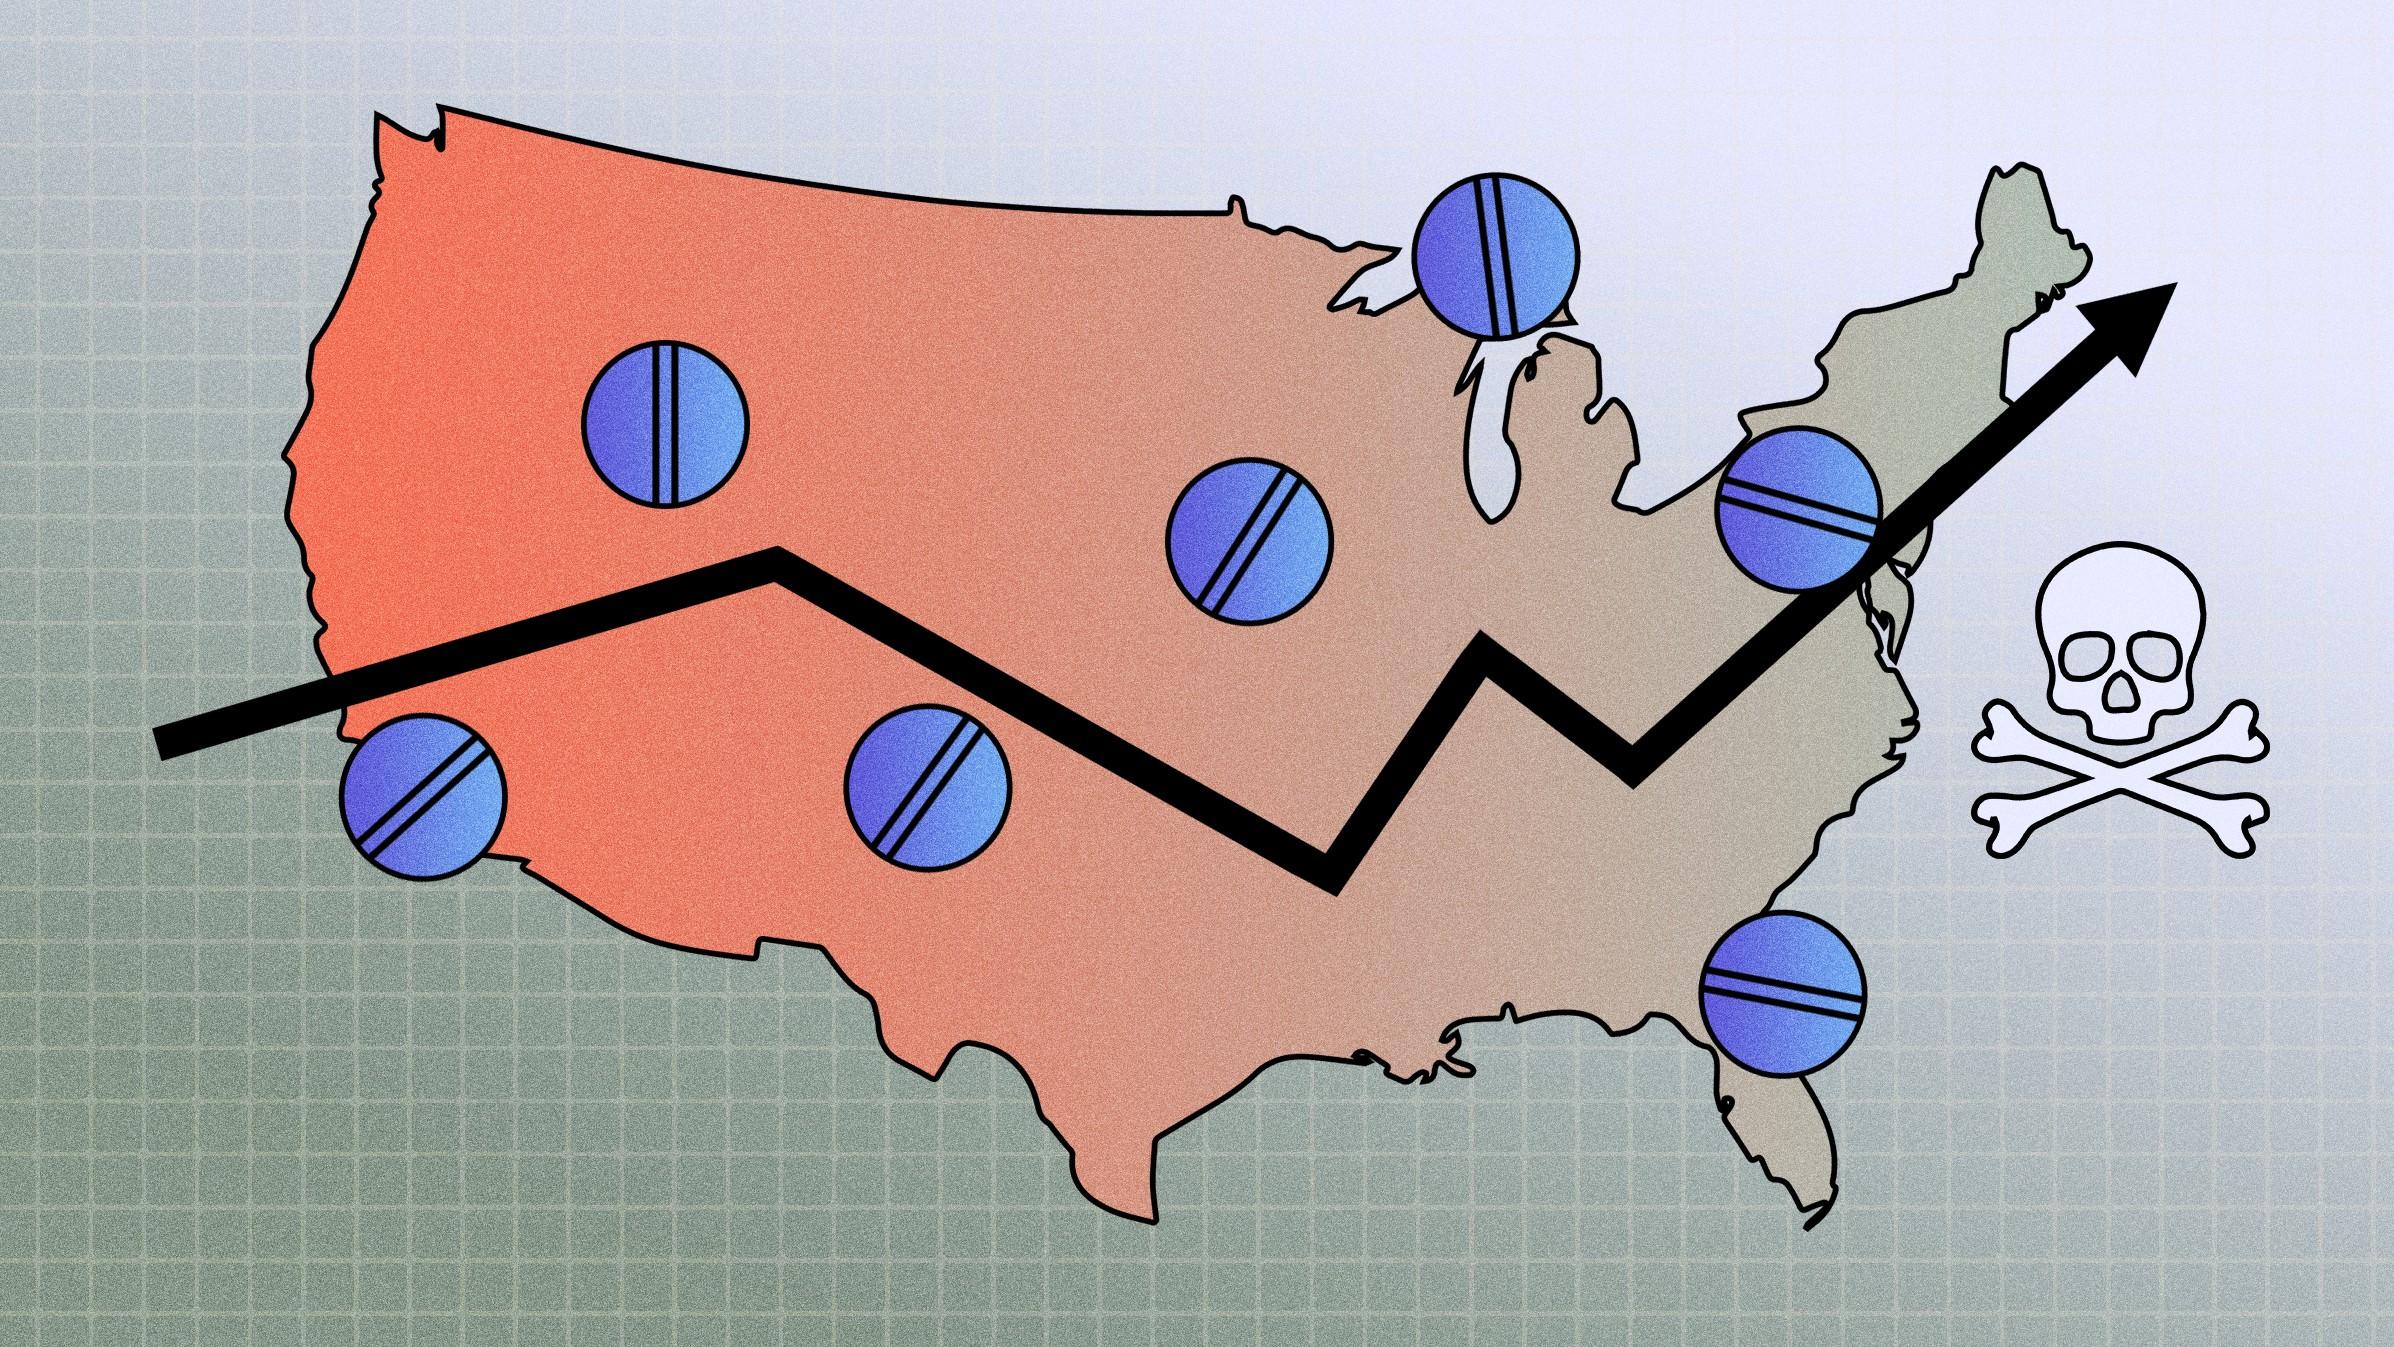 Terrifying Xanax Resurgence in America